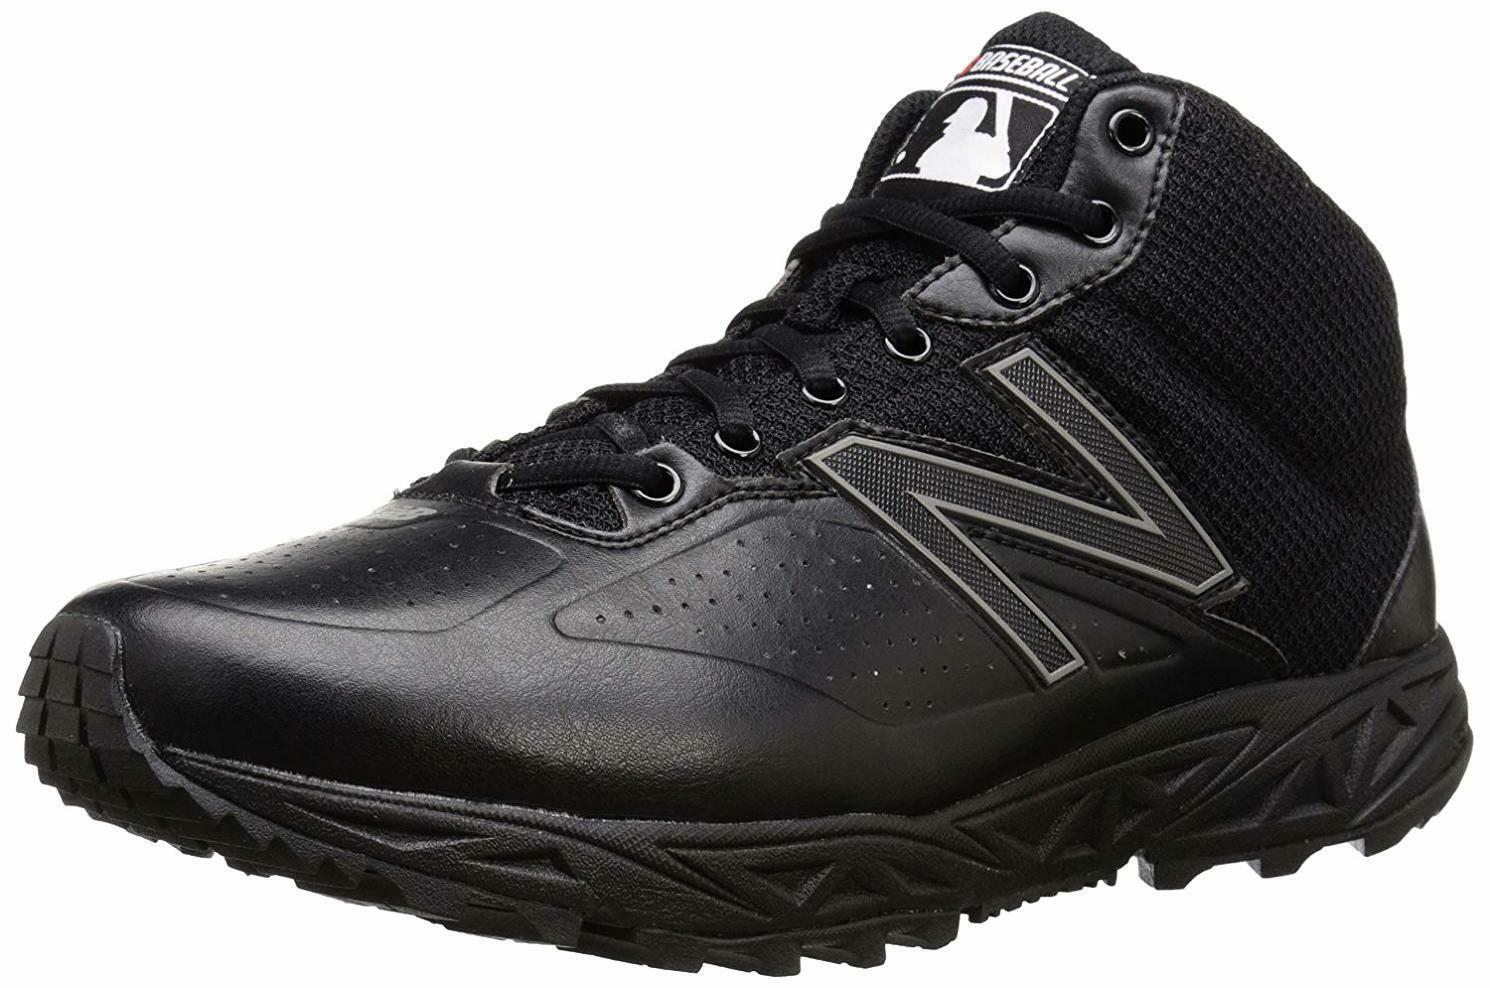 53f88c2bcb6 New Men's MU950V2 Umpire shoes Balance Mid nuqdbx3182-Athletic Shoes